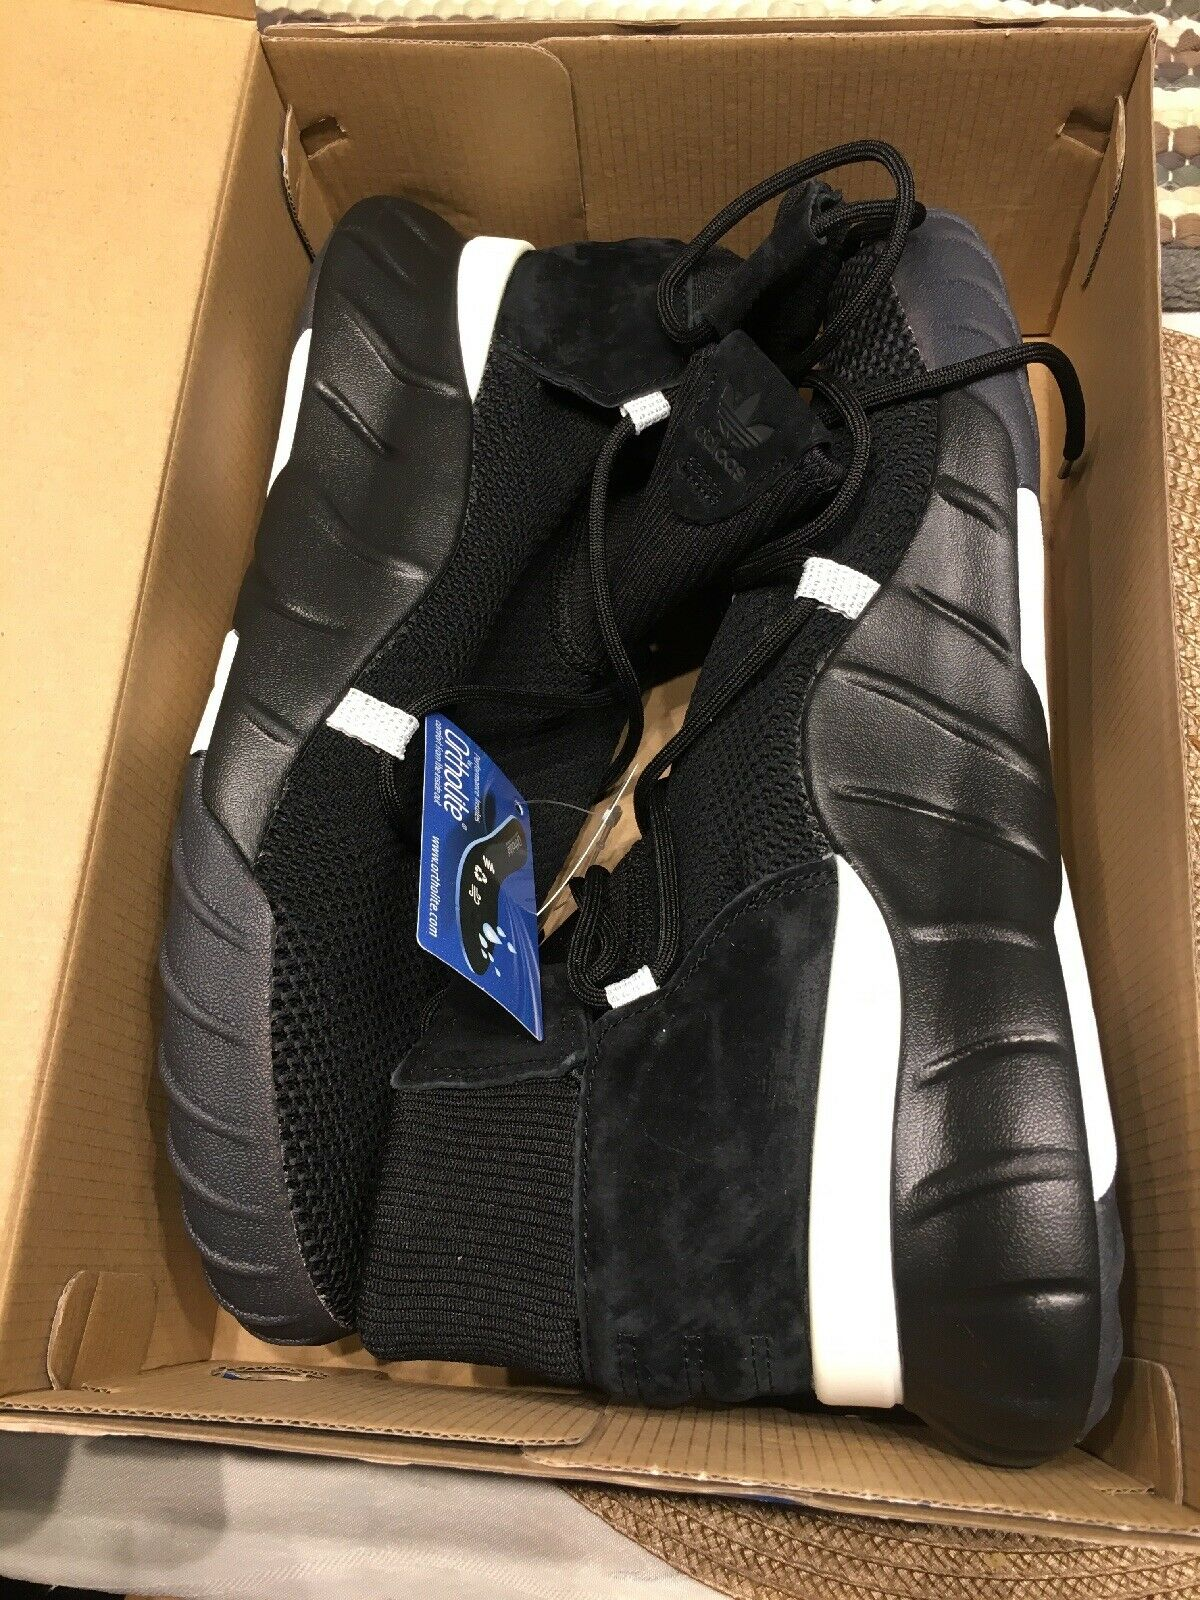 Adidas Tubular X 2.0 PK Mens Black Primeknit shoes Size 9.5   CQ1374